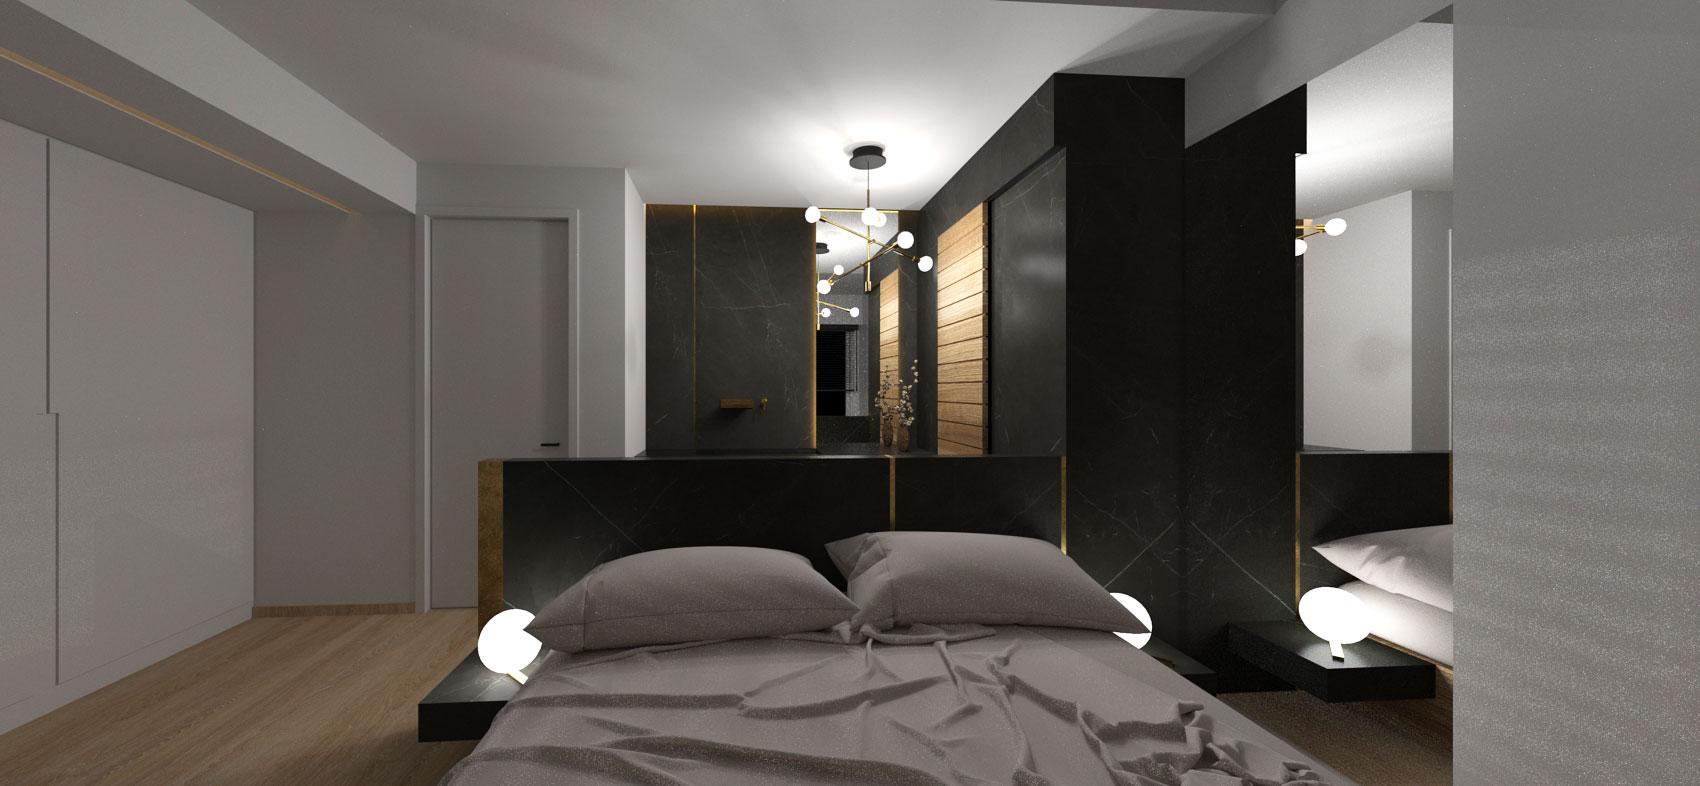 archicostudio_house-yk16_master2